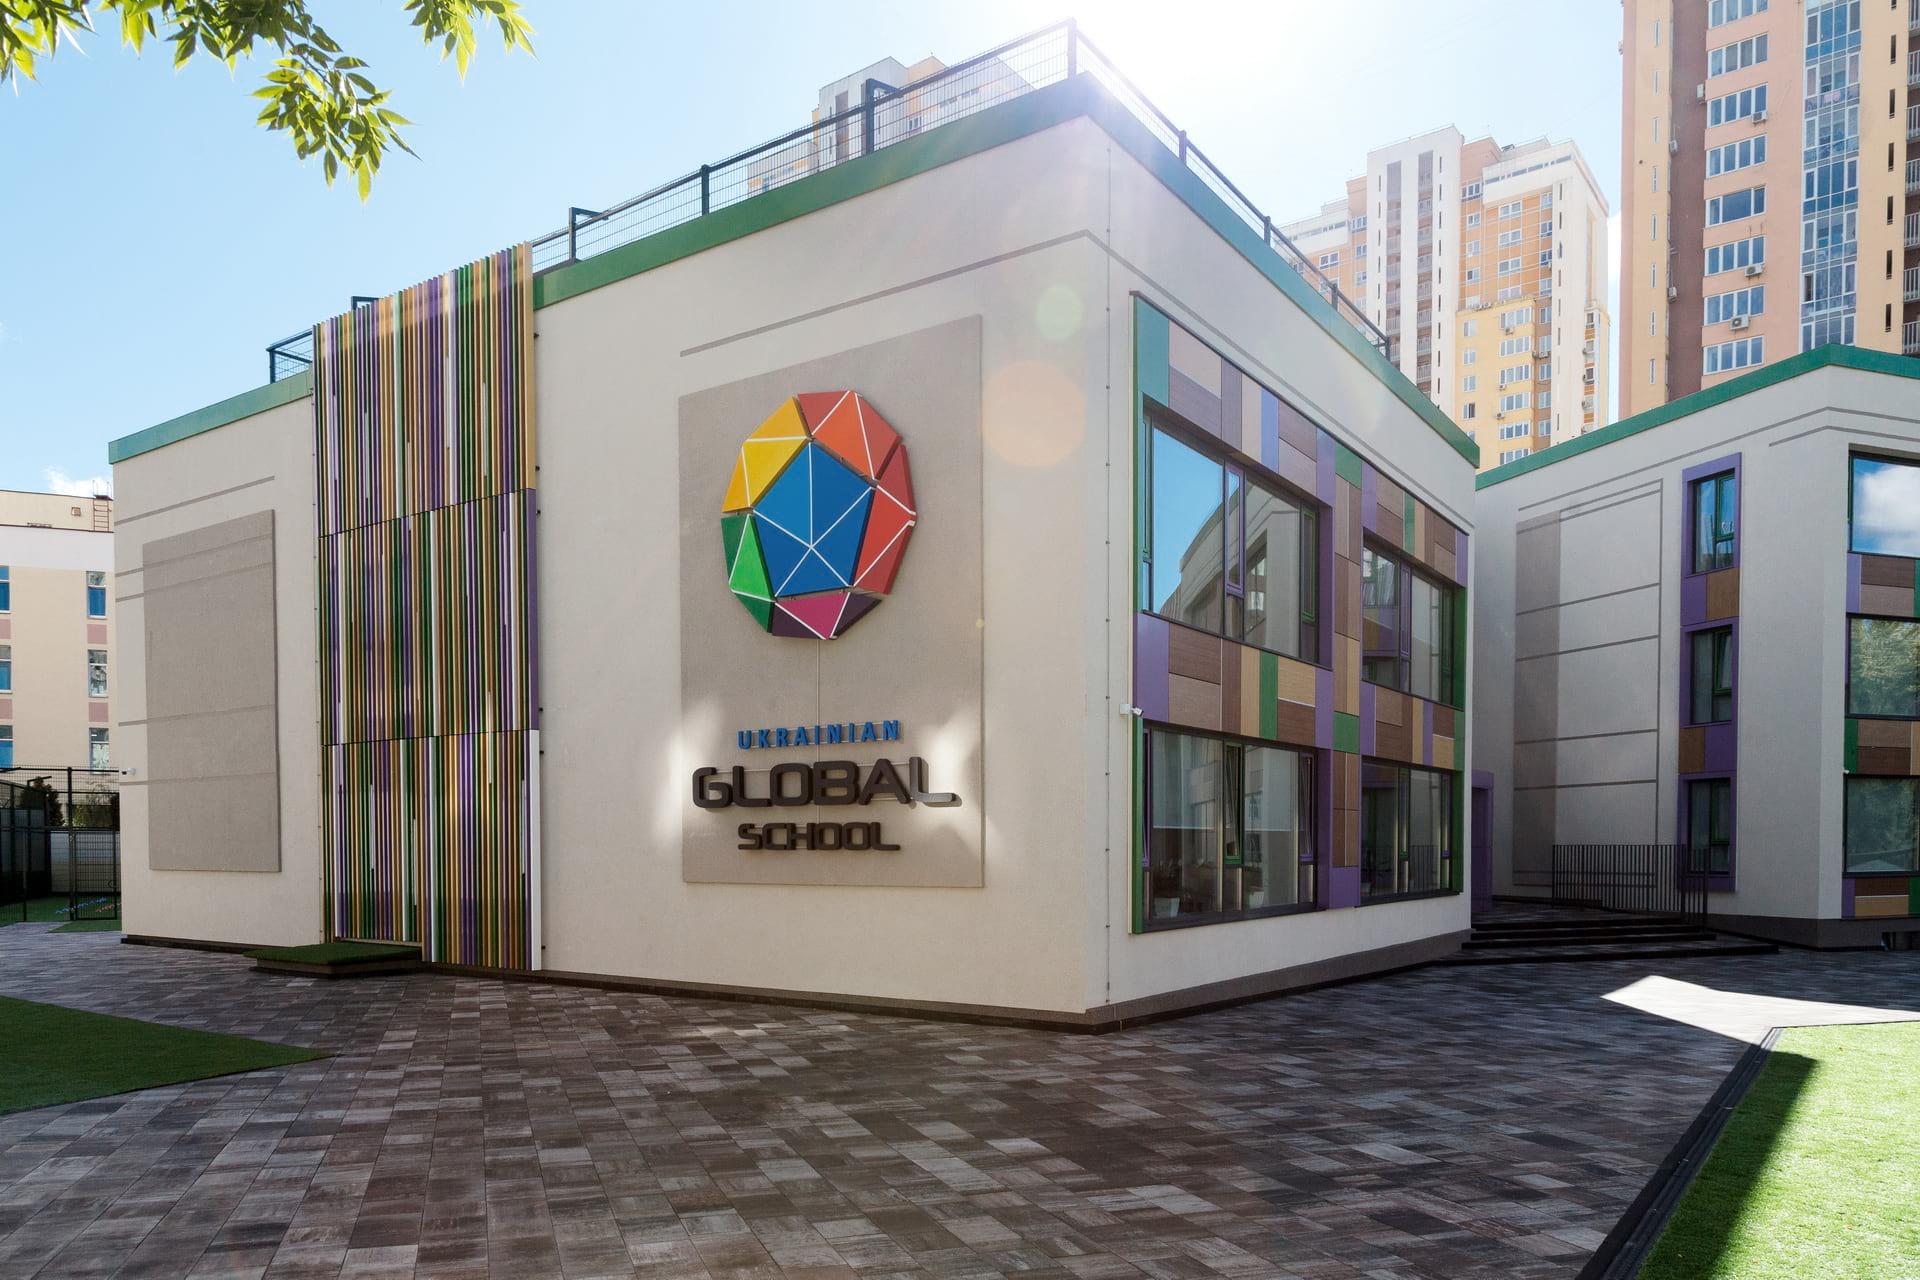 Ukrainian Global School